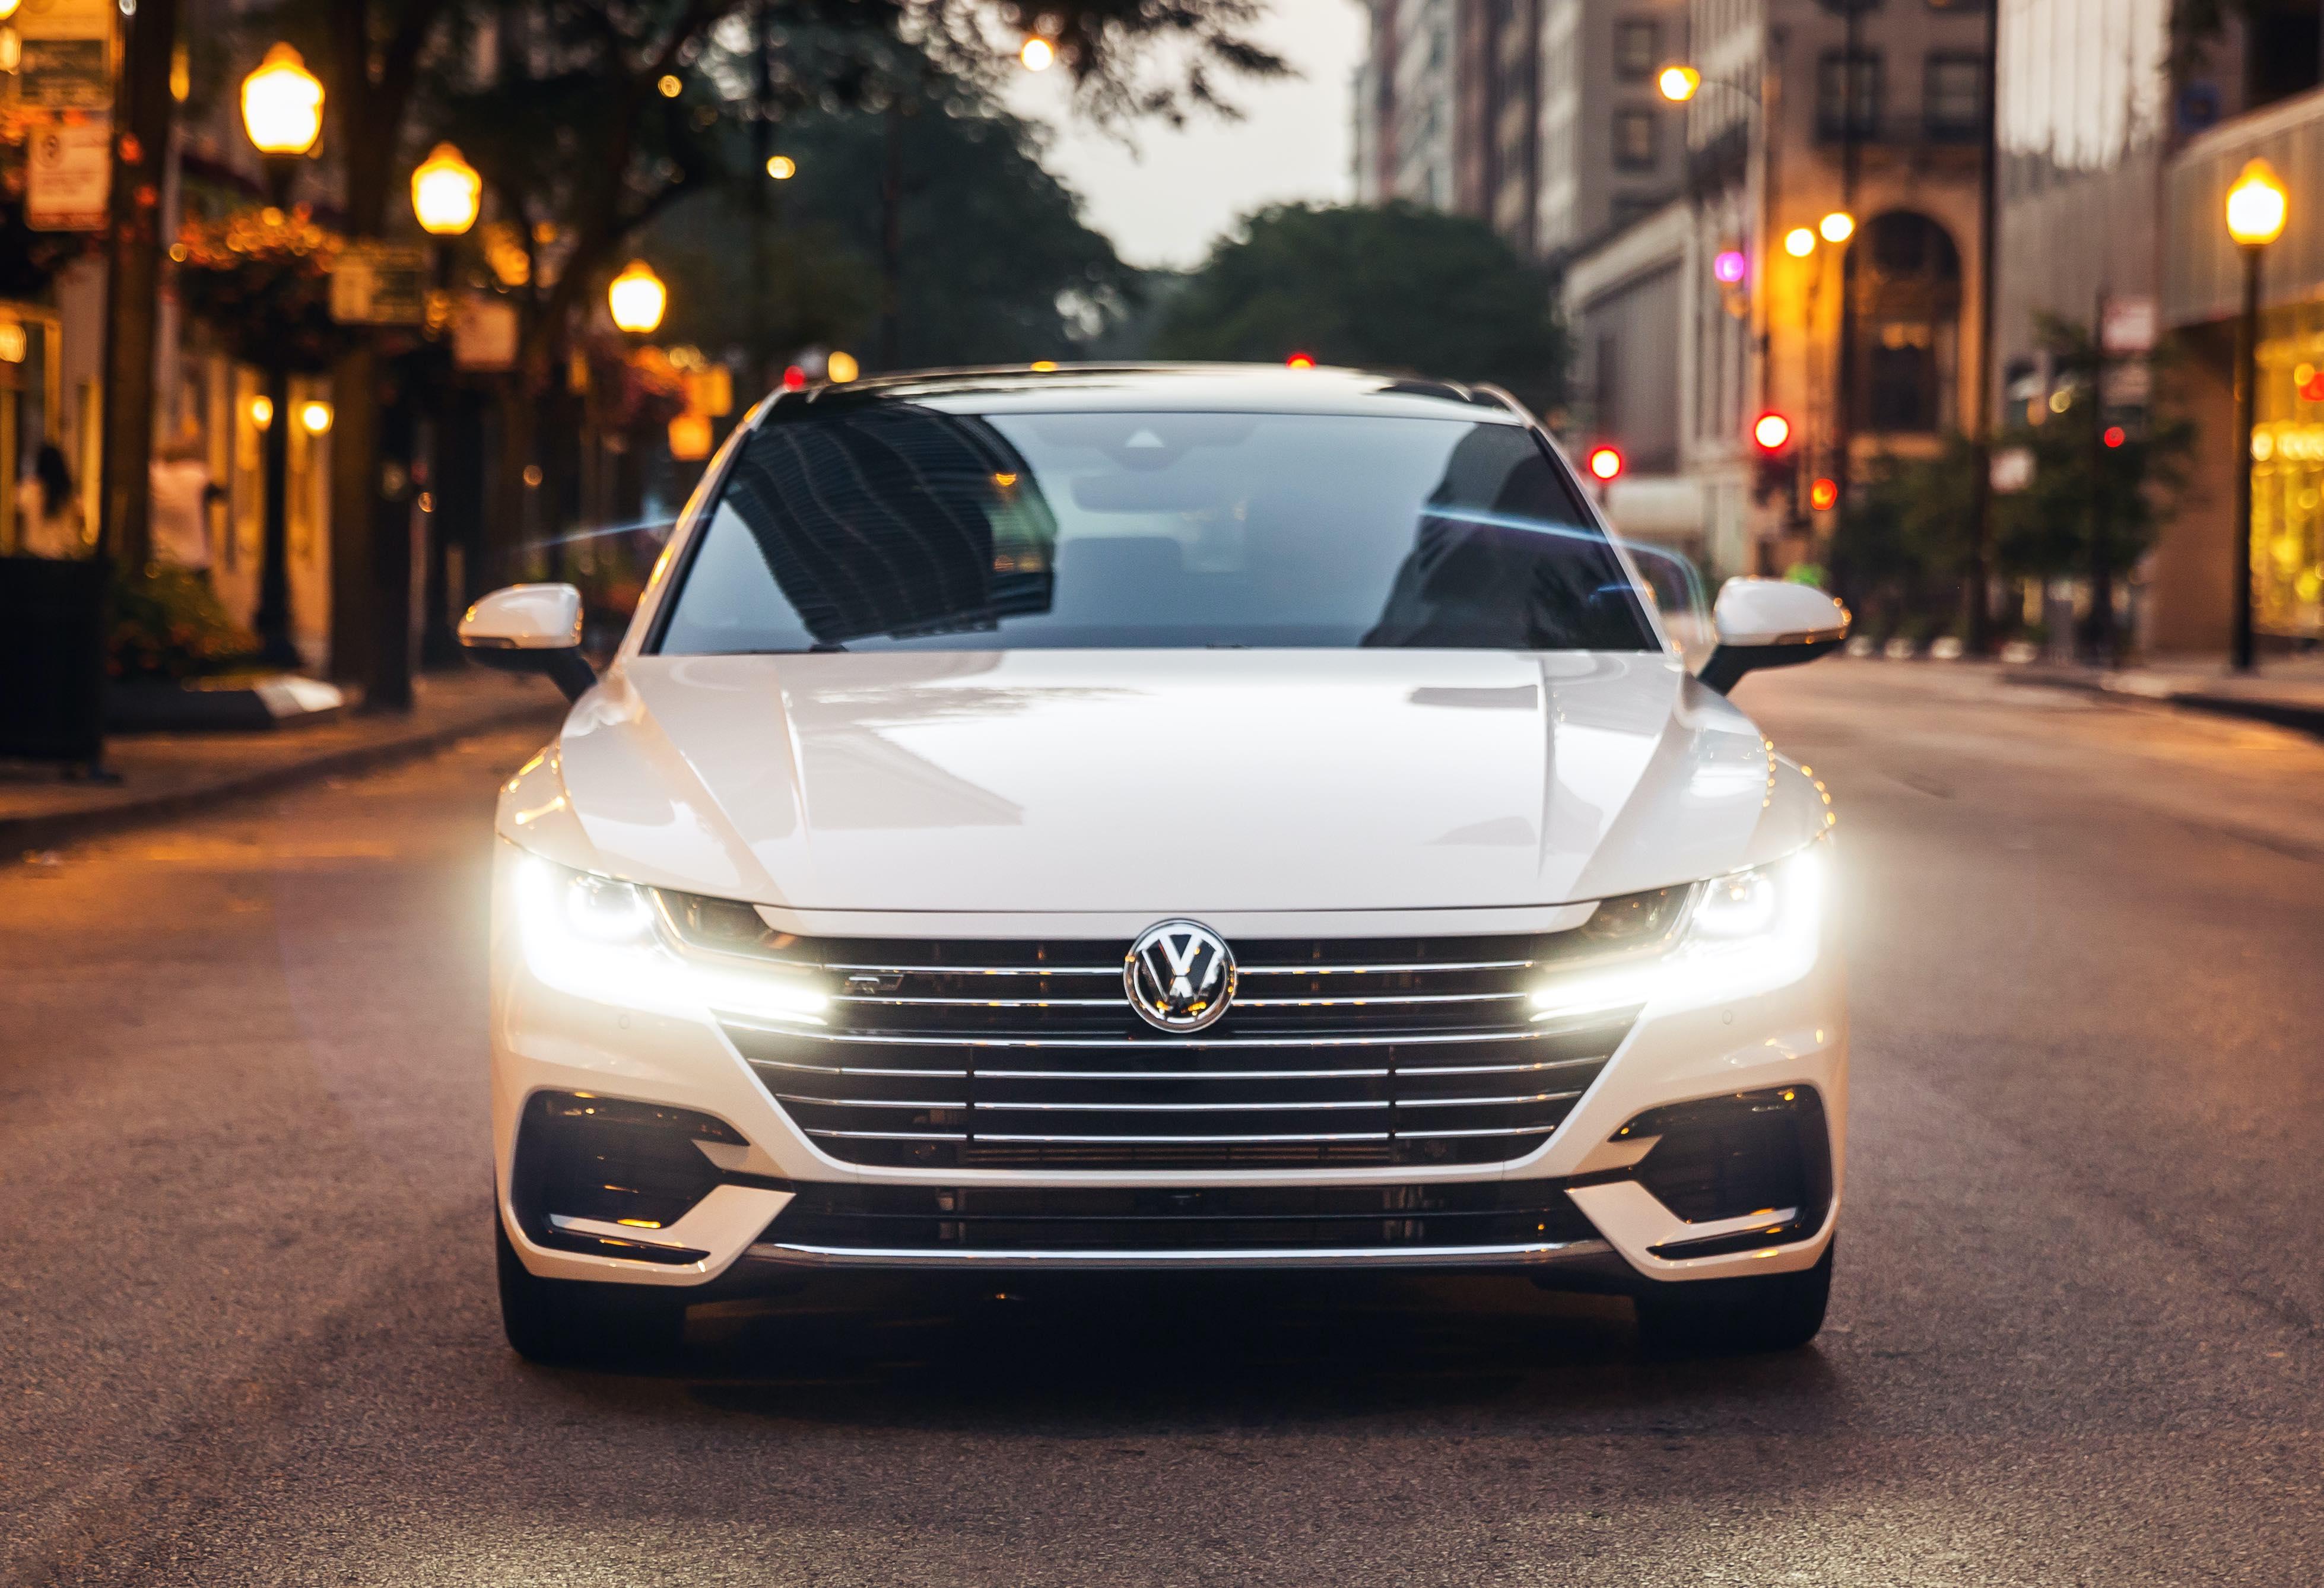 2020 VW Arteon white front view